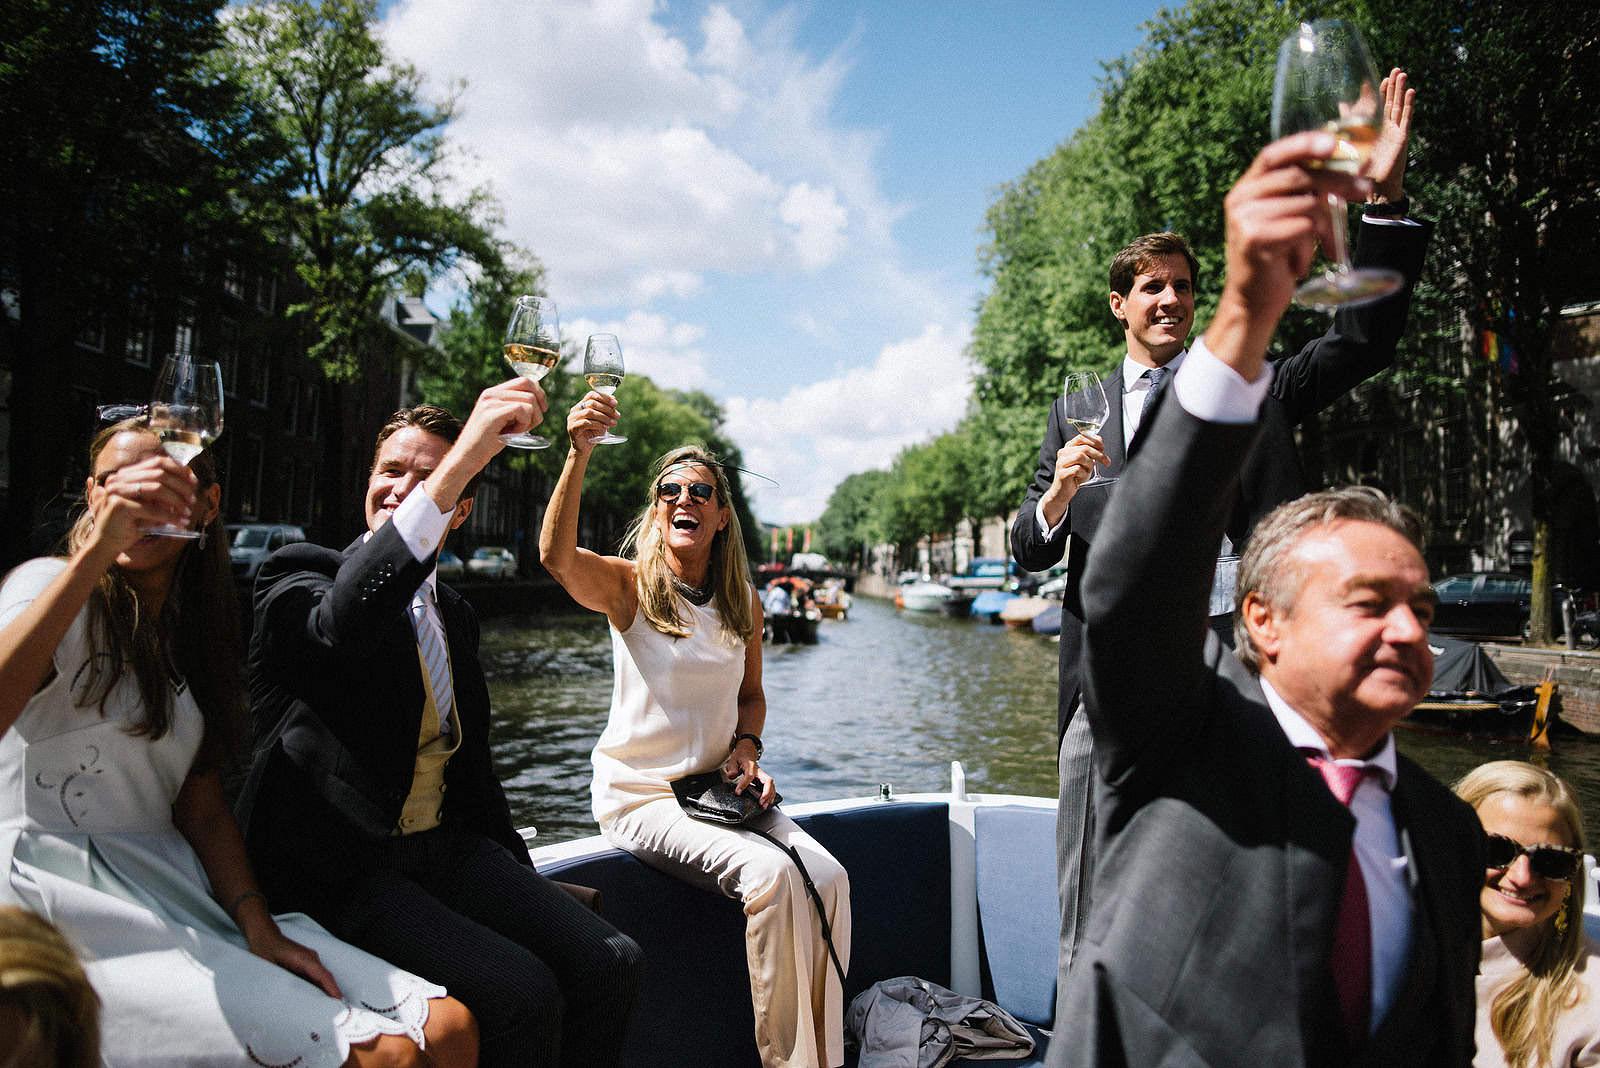 Fotograf Konstanz - Destination Wedding Photographer Amsterdam 058 - Destination Wedding Amsterdam  - 166 -